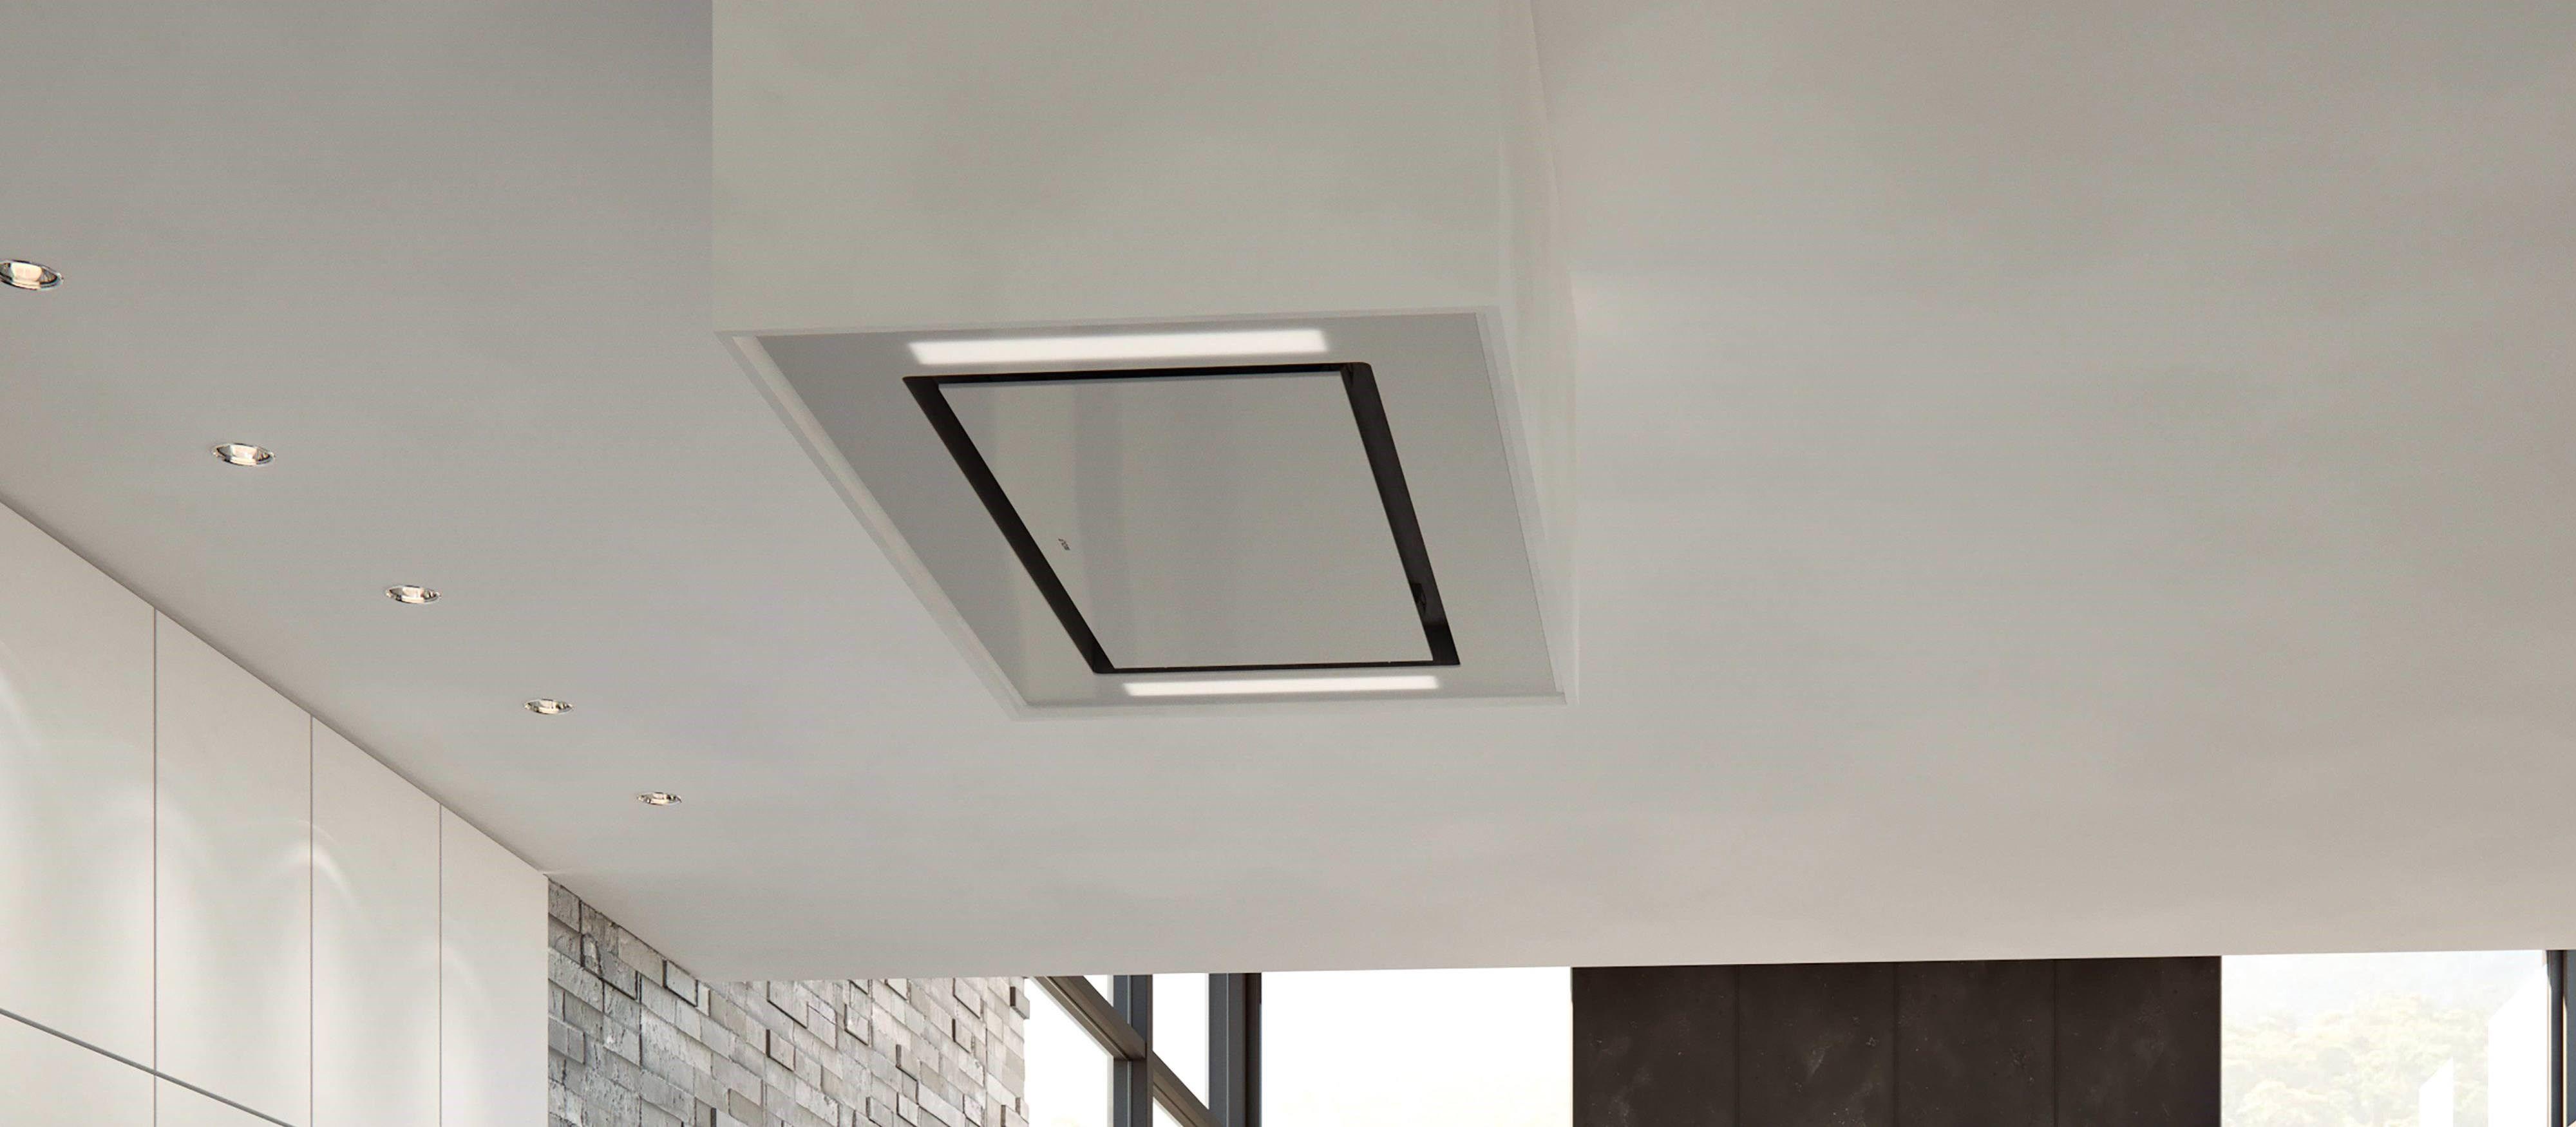 36 Ceiling Mounted Hood White Glass White Glass Glass Range